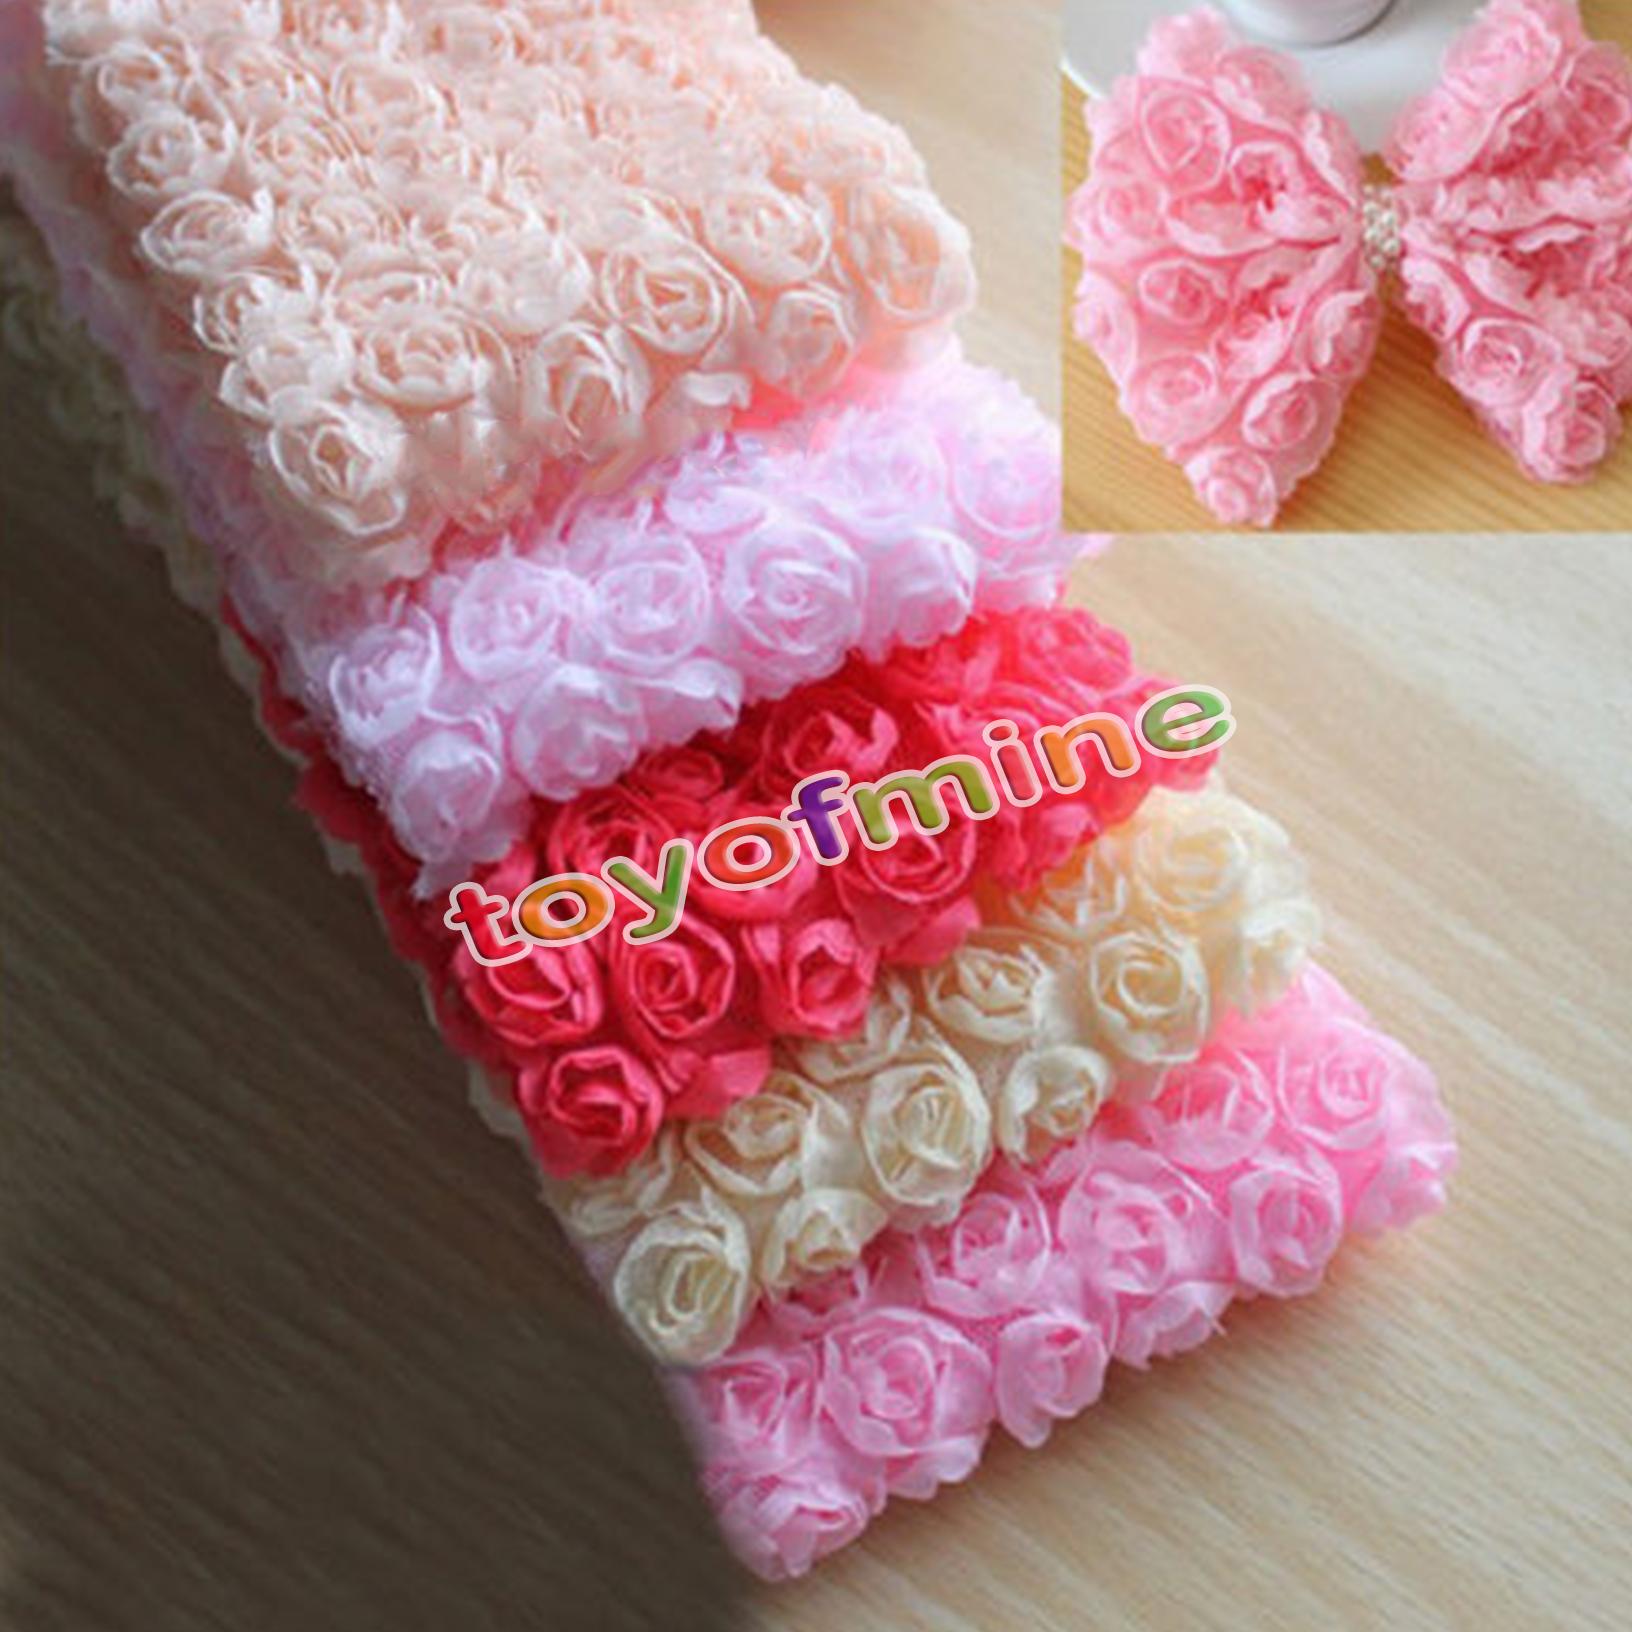 Fabric Flower Trim: 1 Yard 6 Row 3D Chiffon Rose Flower Lace Trim Gift Sewing